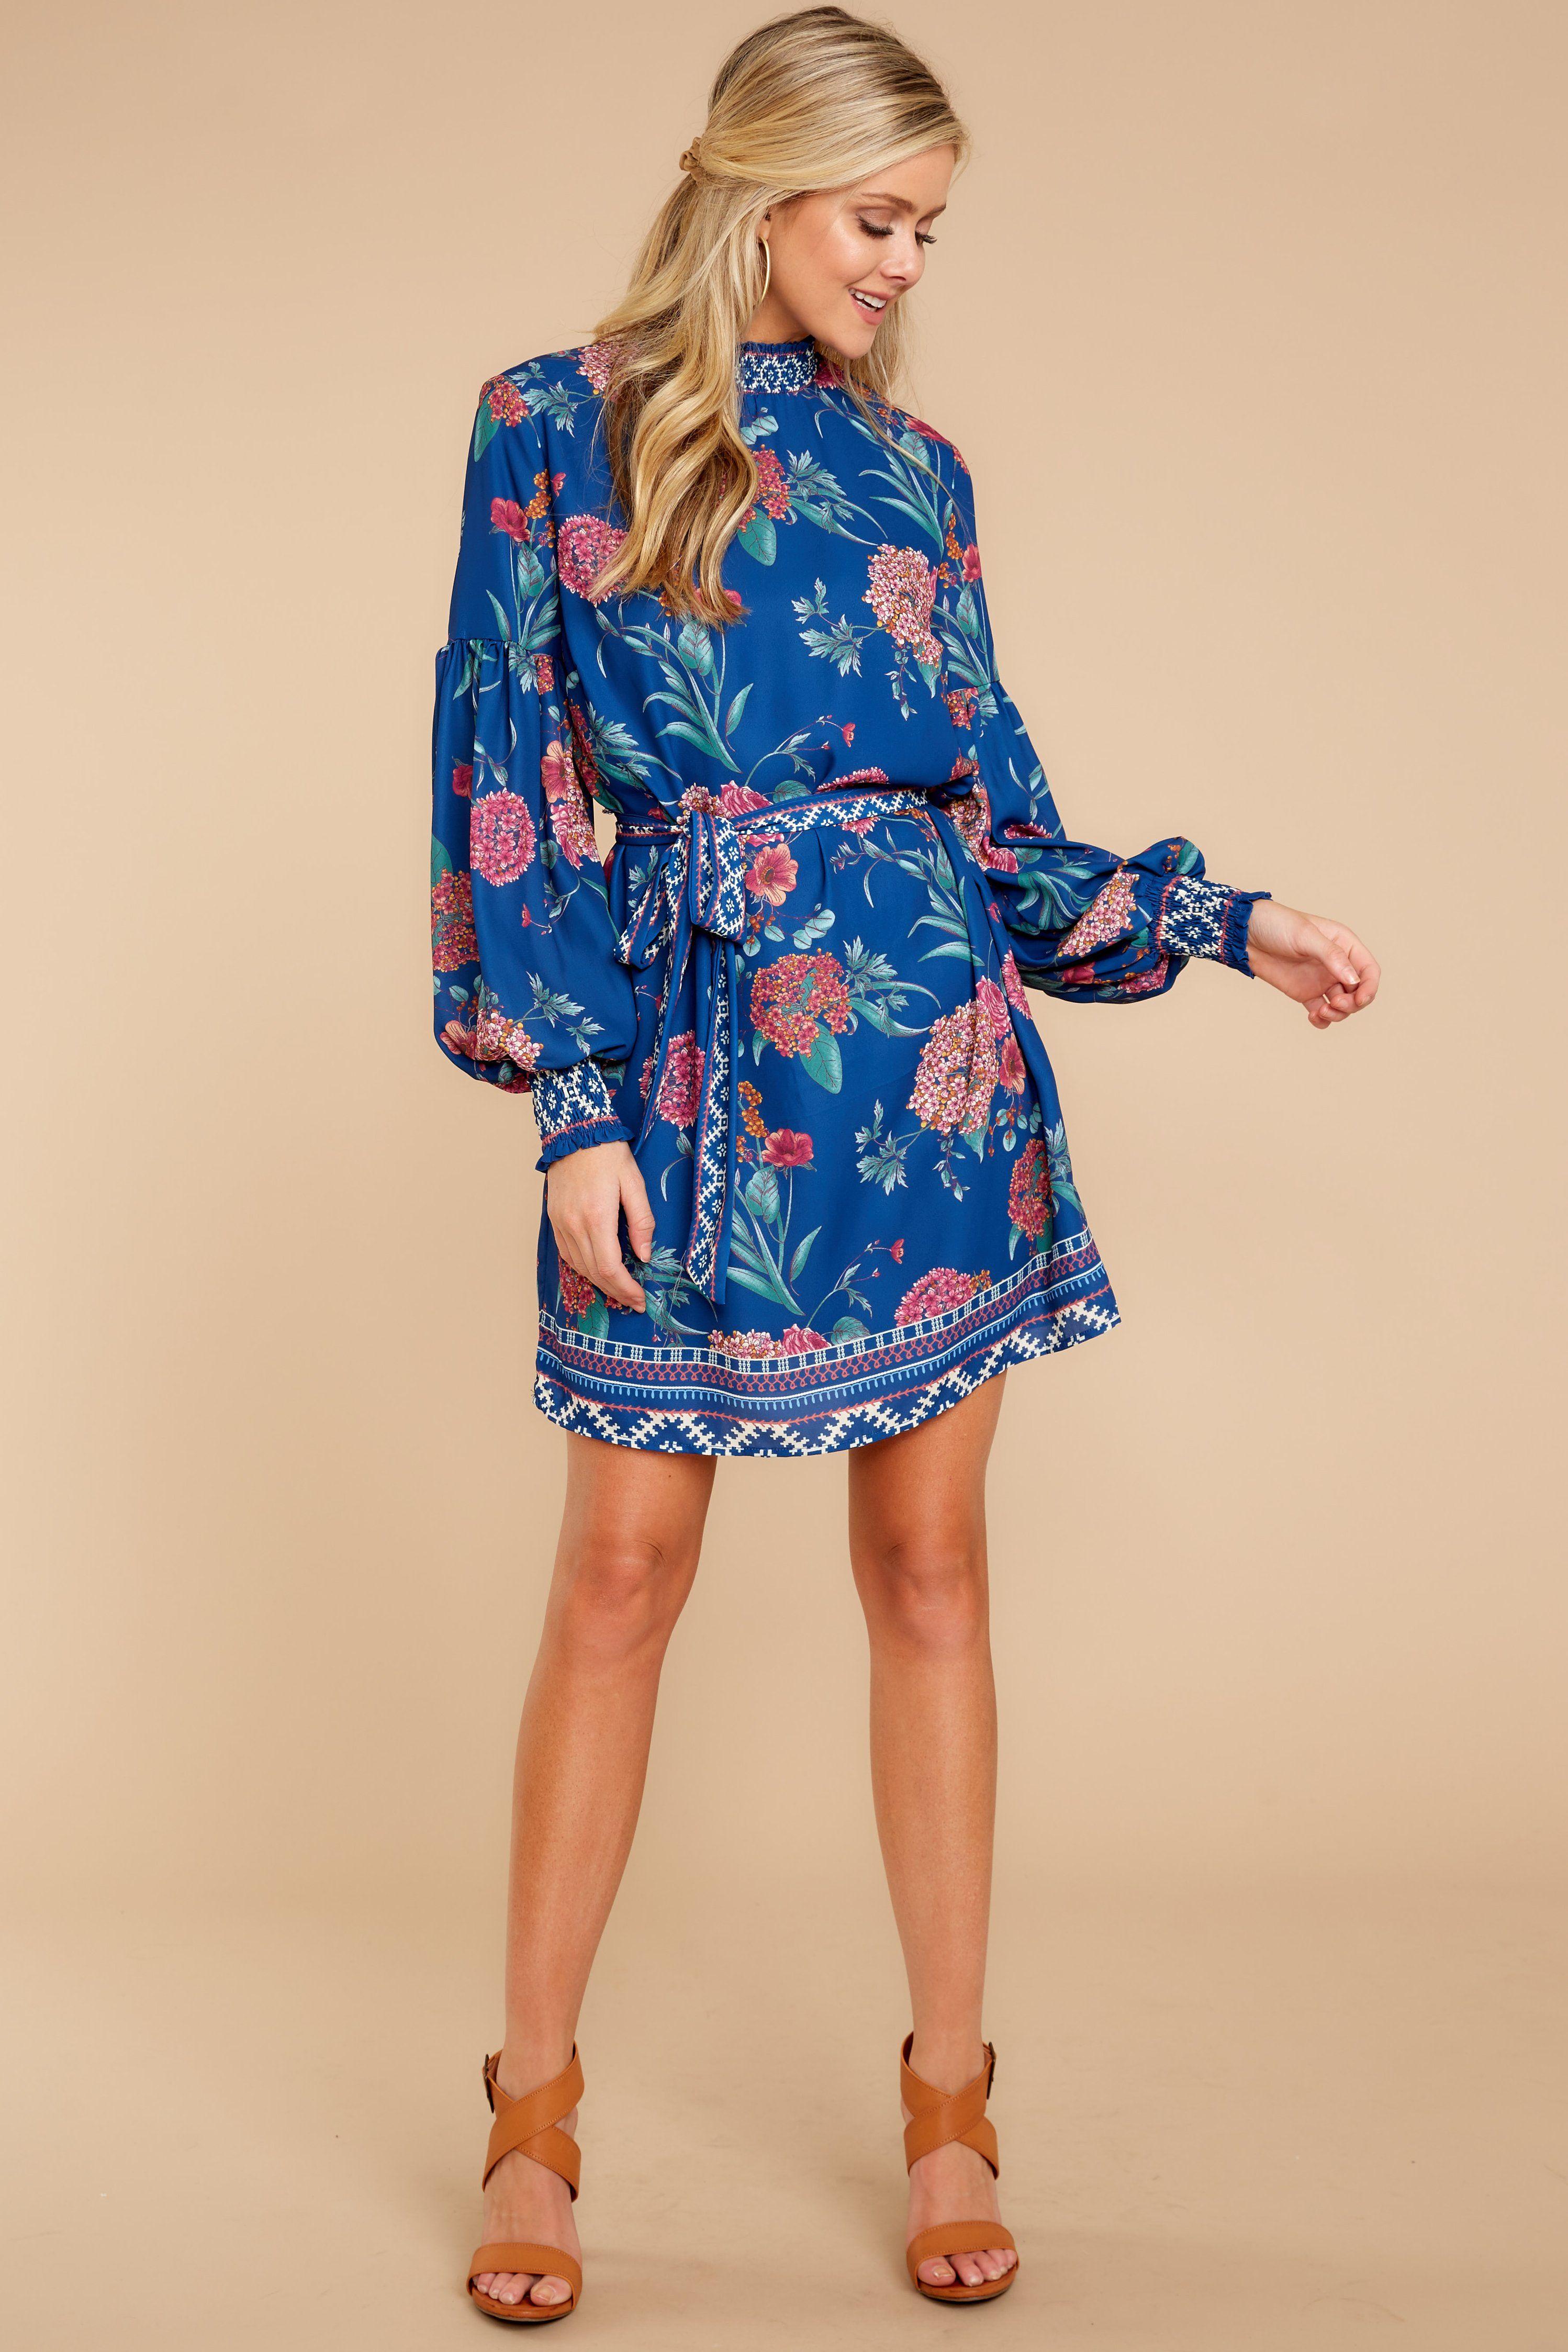 8e4b9c2aaf Chic Blue Floral Dress - Short Floral Print Dress - Dress -  44.00 – Red  Dress Boutique